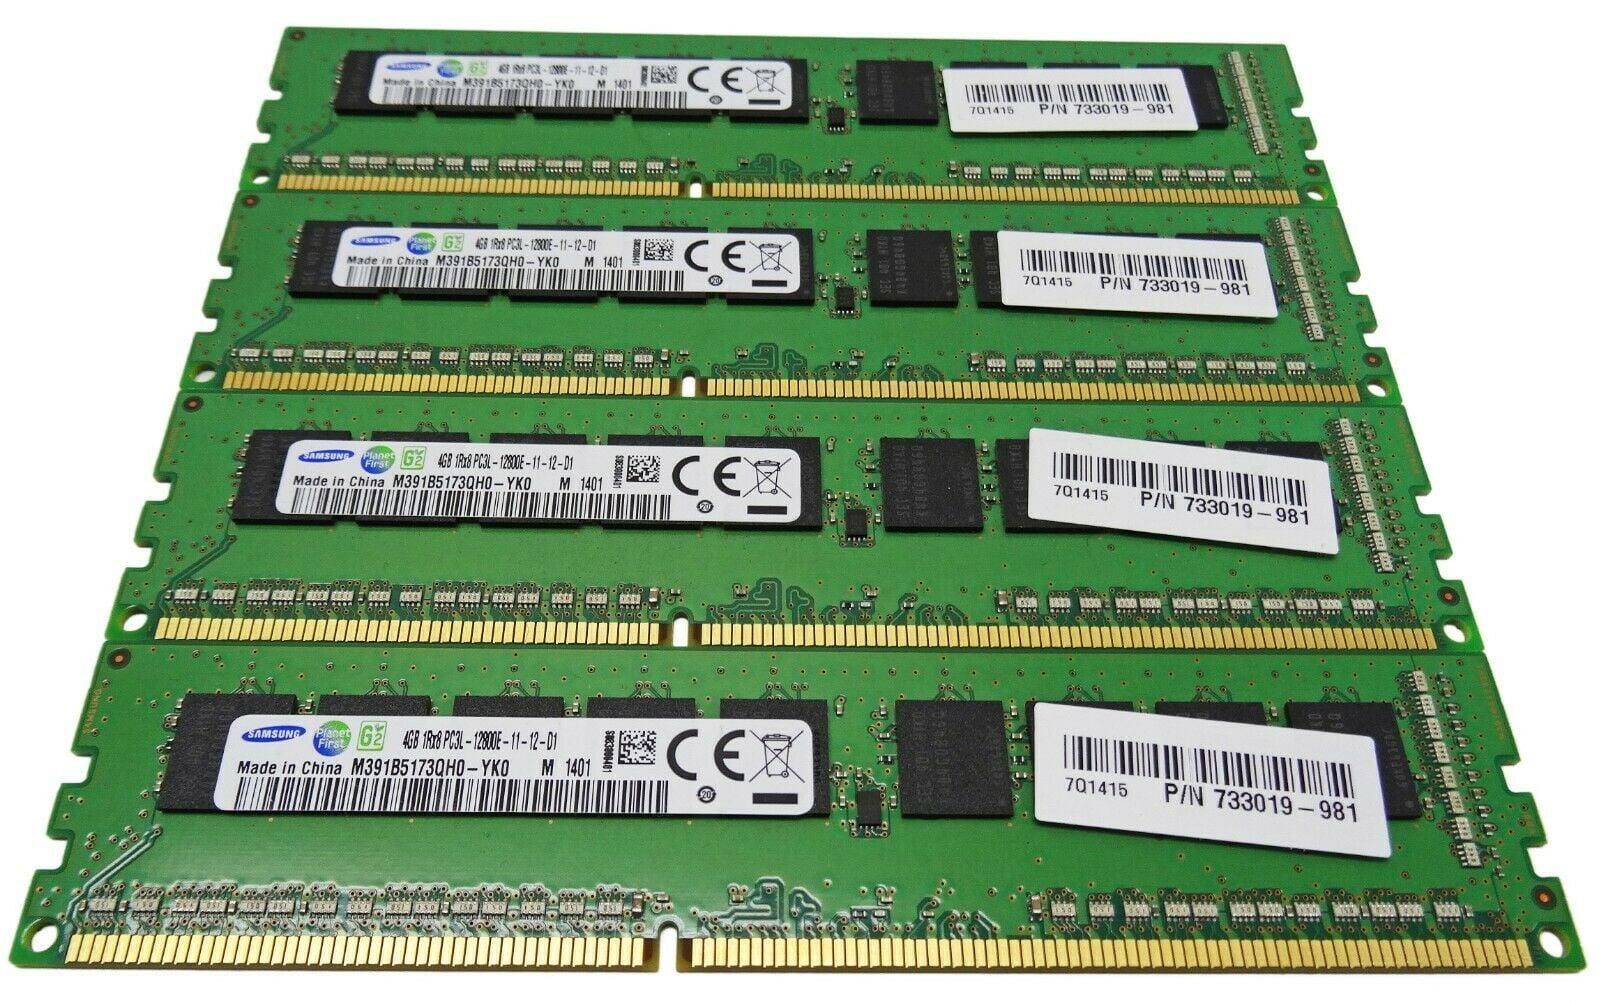 Samsung 16GB (4 x 4GB) 1Rx8 PC3L-12800E DDR3-1600MHz M391B5173QH0-YK0